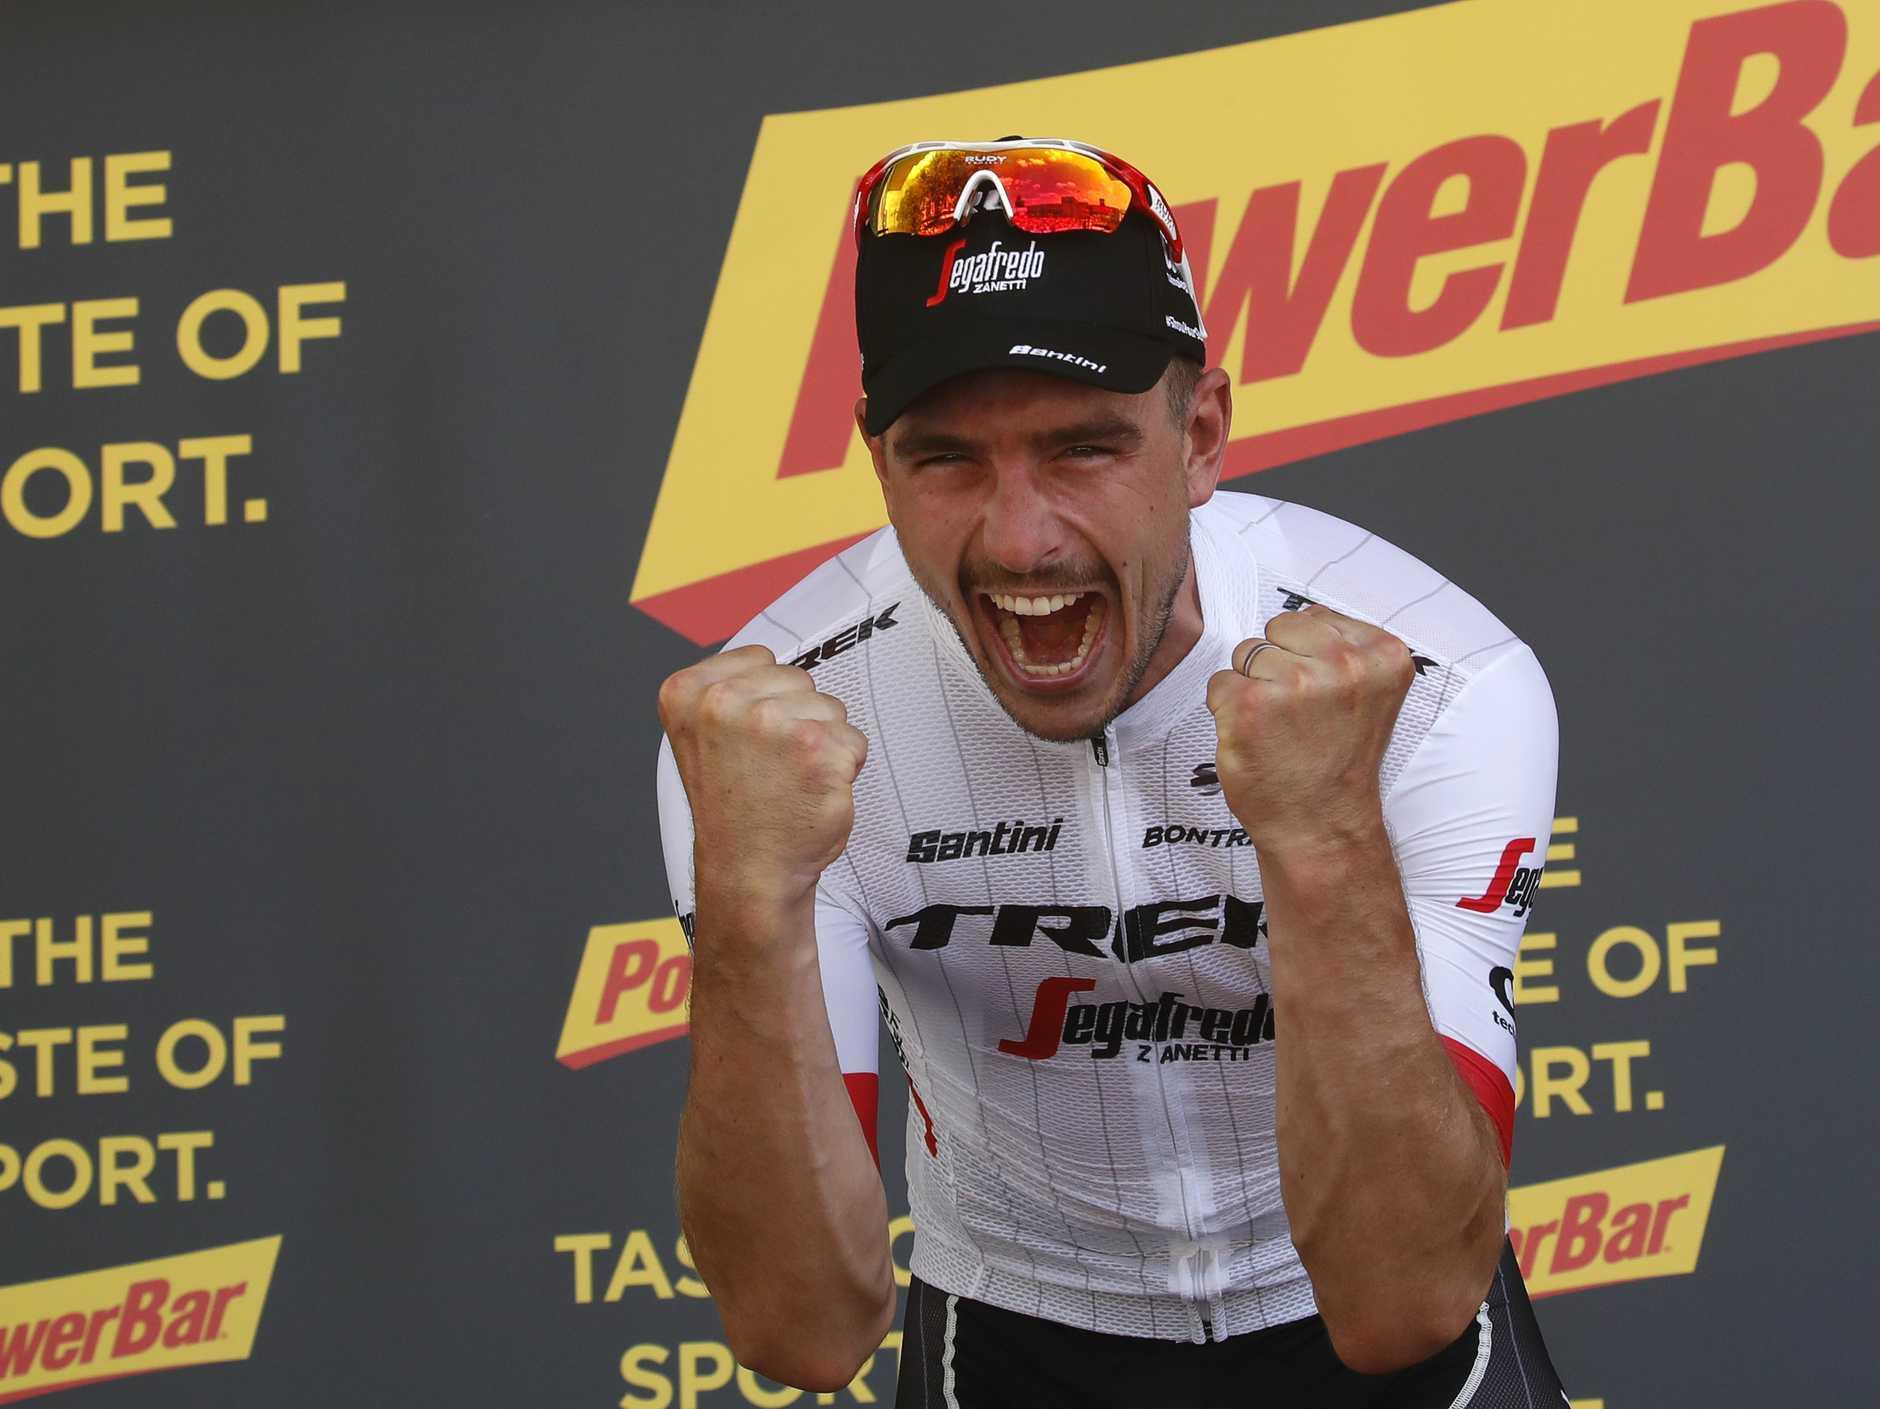 John Degenkolb won the ninth stage of the Tour de France.